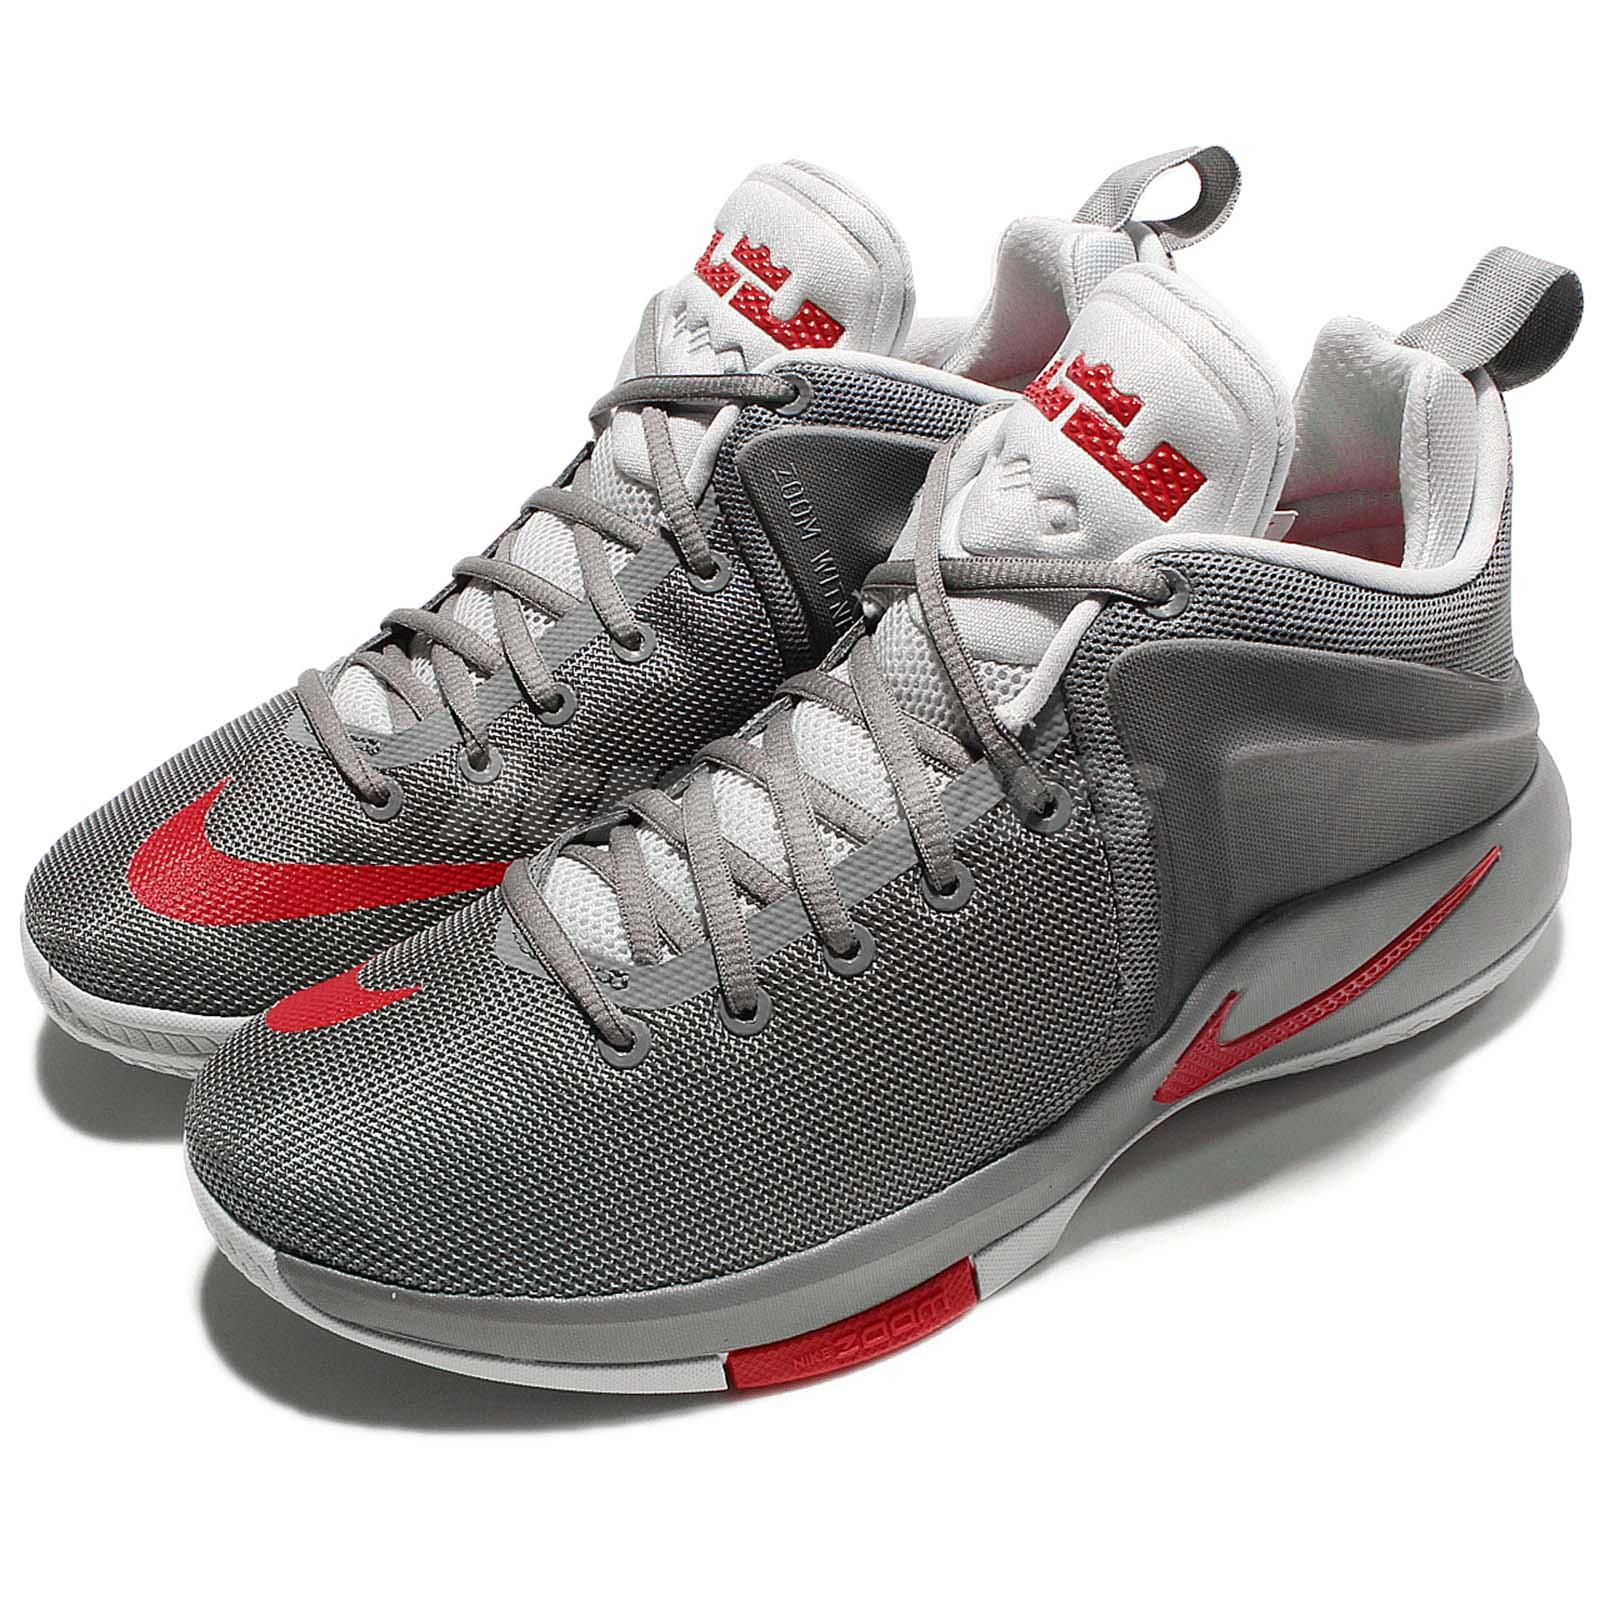 Nike Pure Platinum Custom Shoes